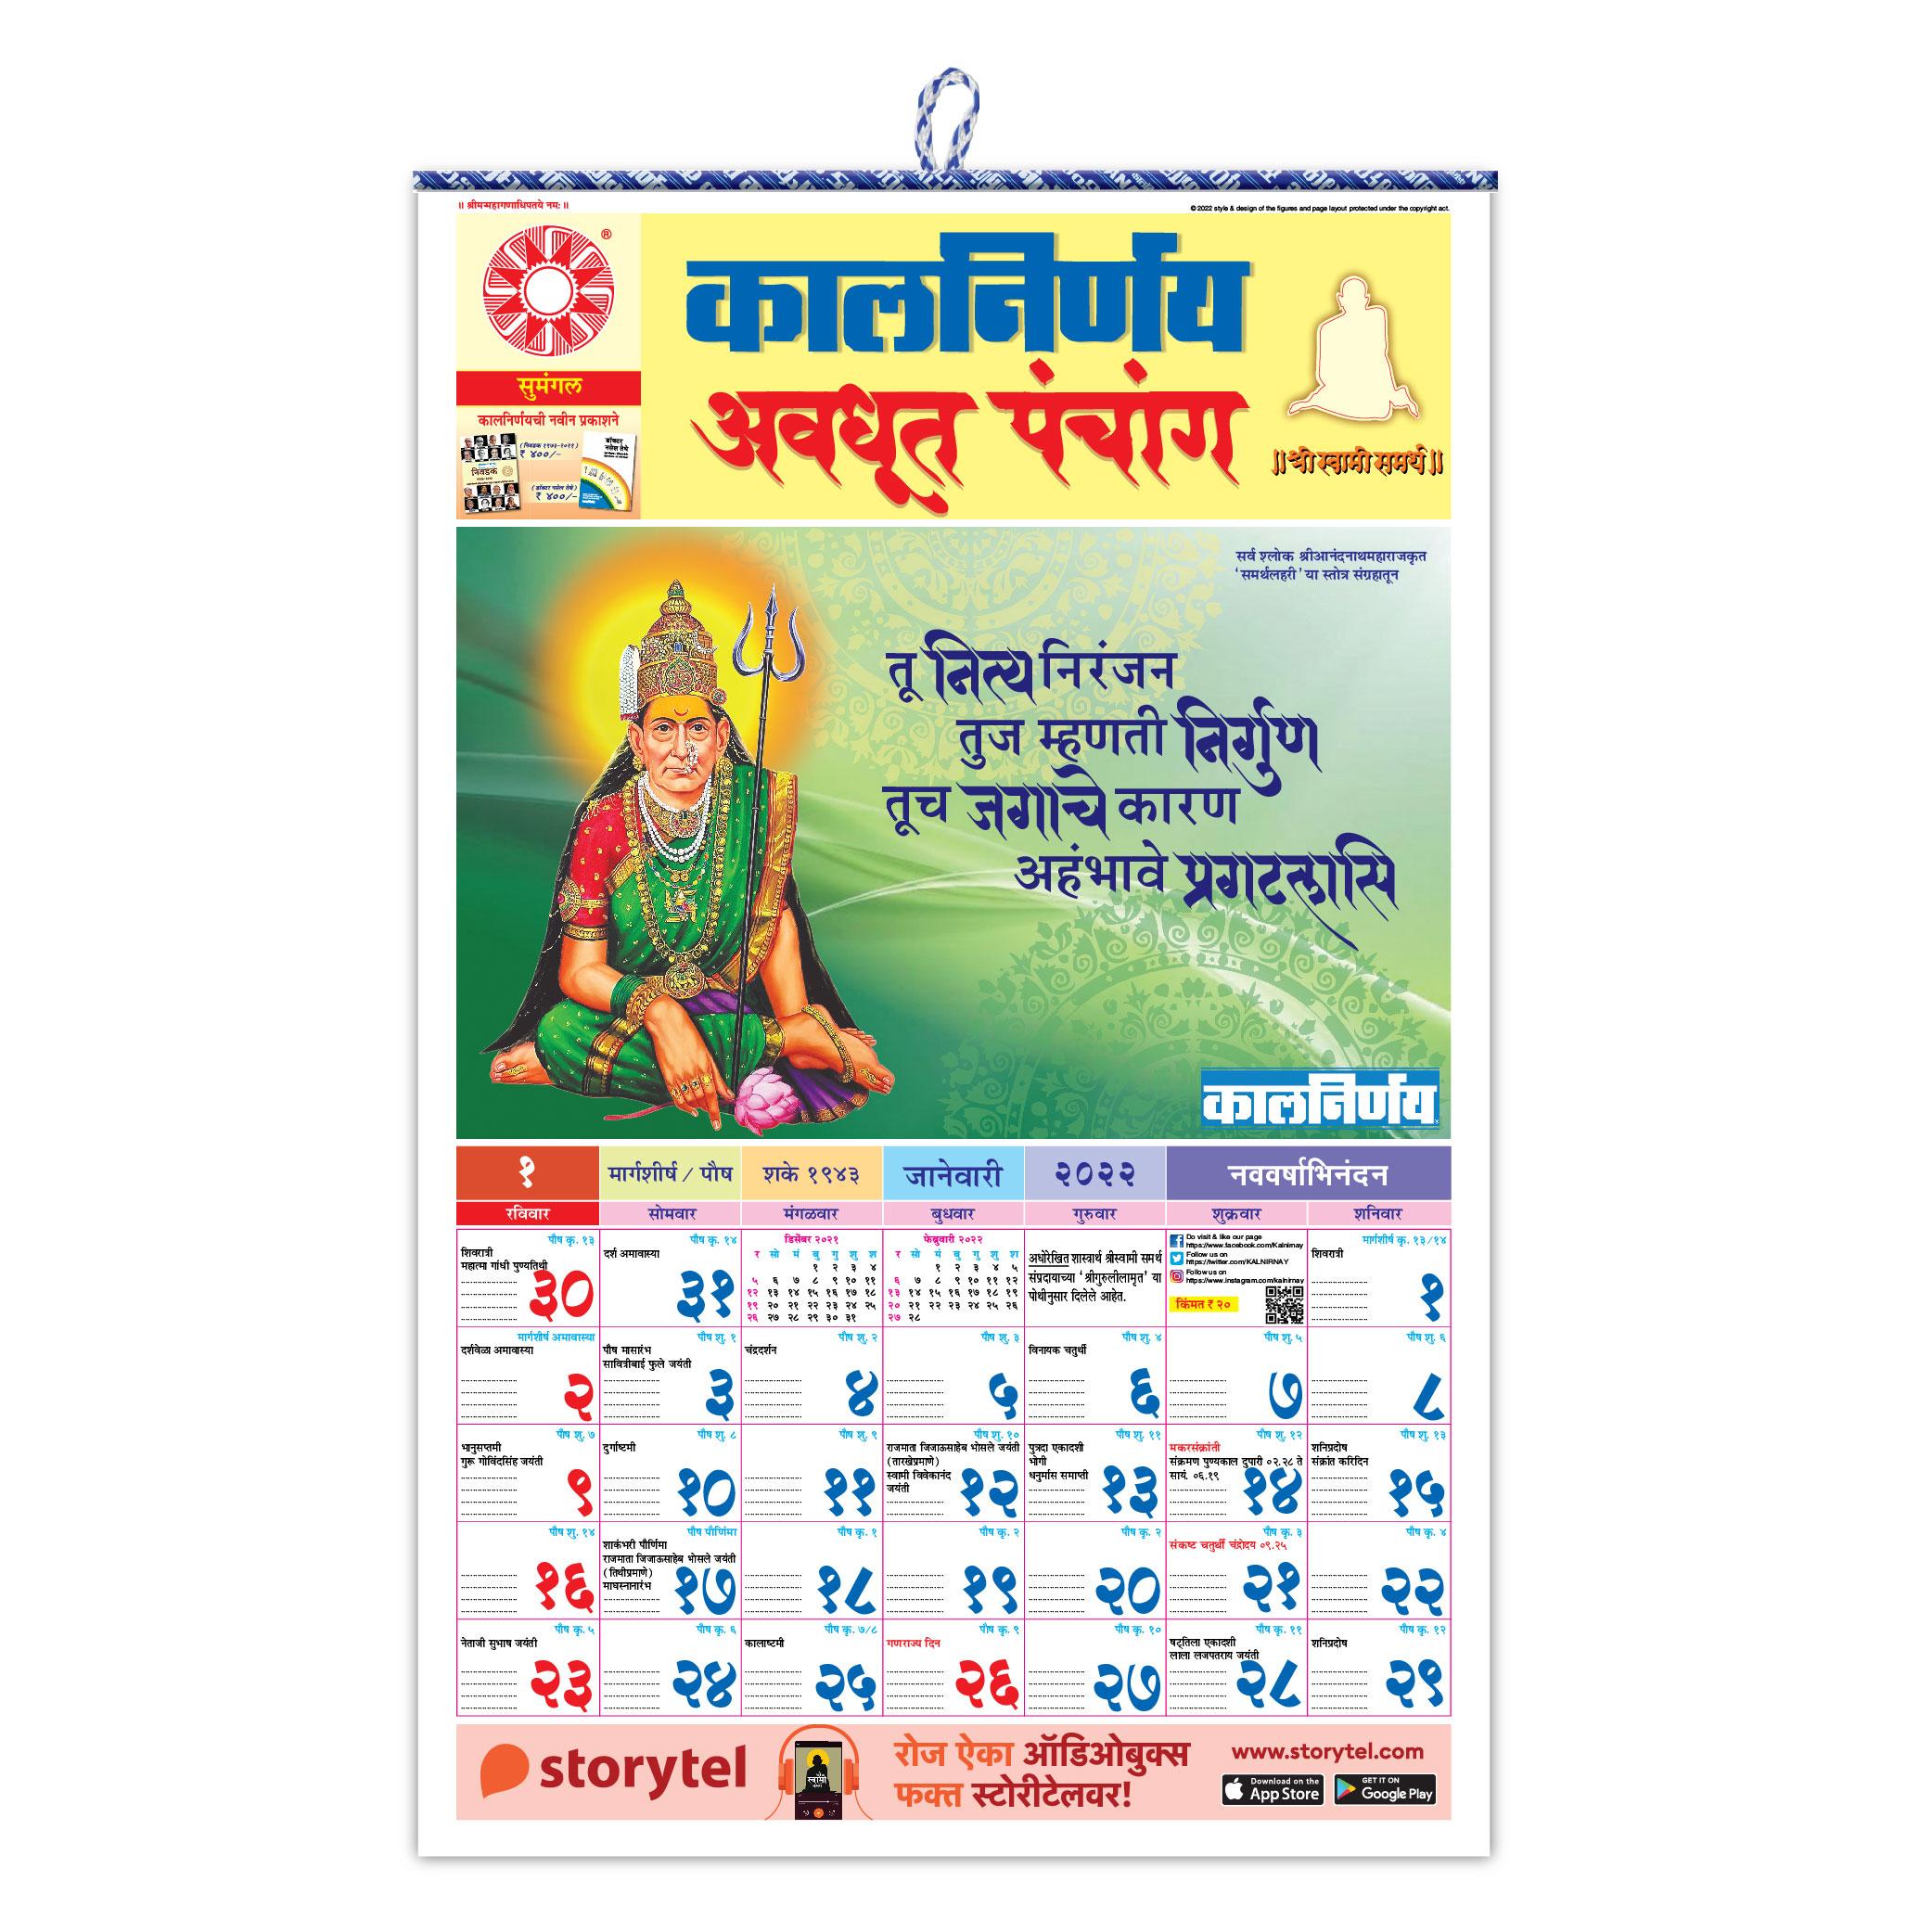 Shree Swami Samarth   श्री स्वामी समर्थ   Shri Swami Samarth   Akkalkot Swami Samarth   Swami Samarth Math   Swami Samarth   shree swami samarth calendar   shree swami samarth calendar 2022